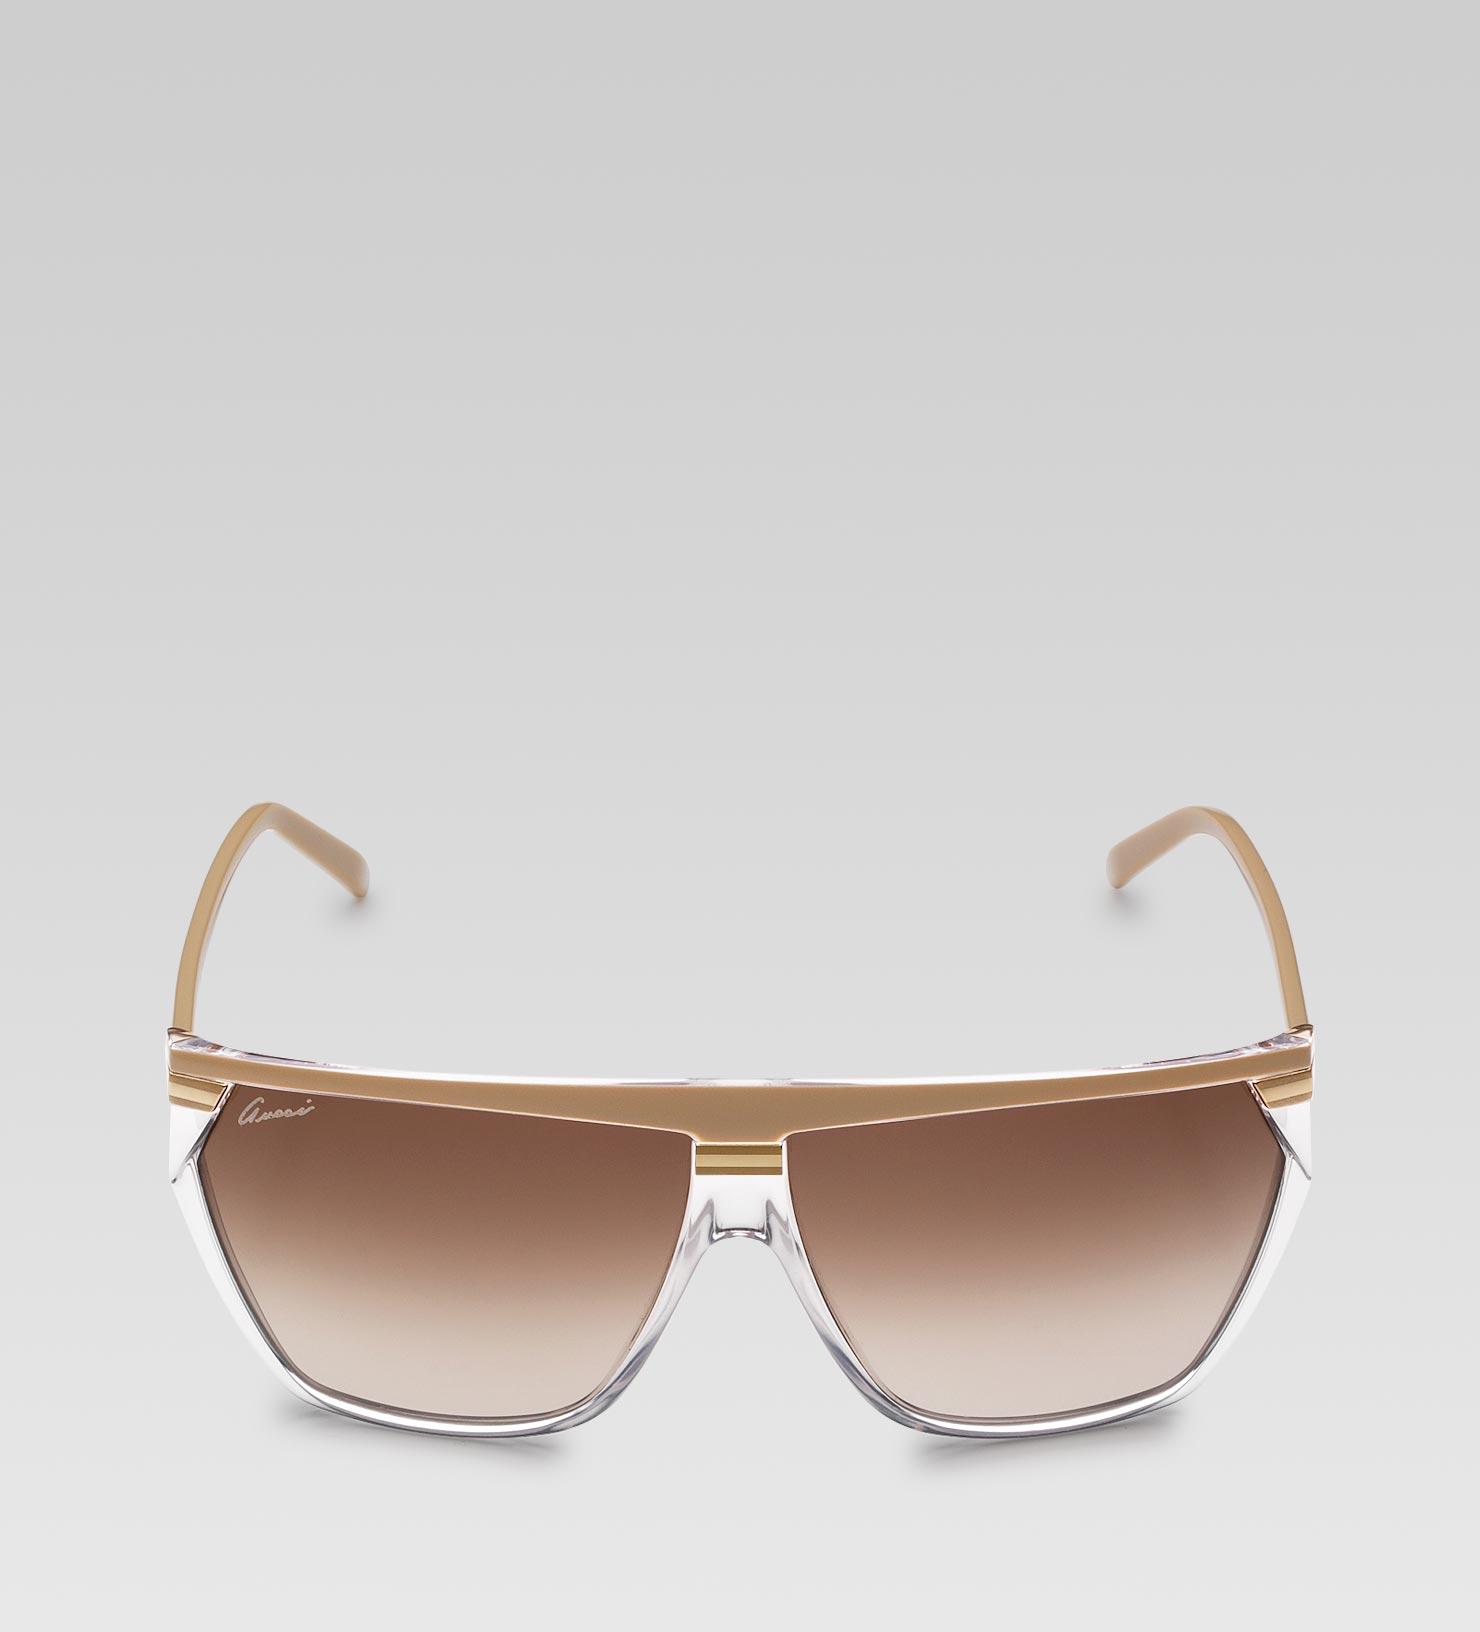 79e736668f1 Lyst - Gucci Medium Rectangle Frame Sunglasses with Gucci Logo On ...